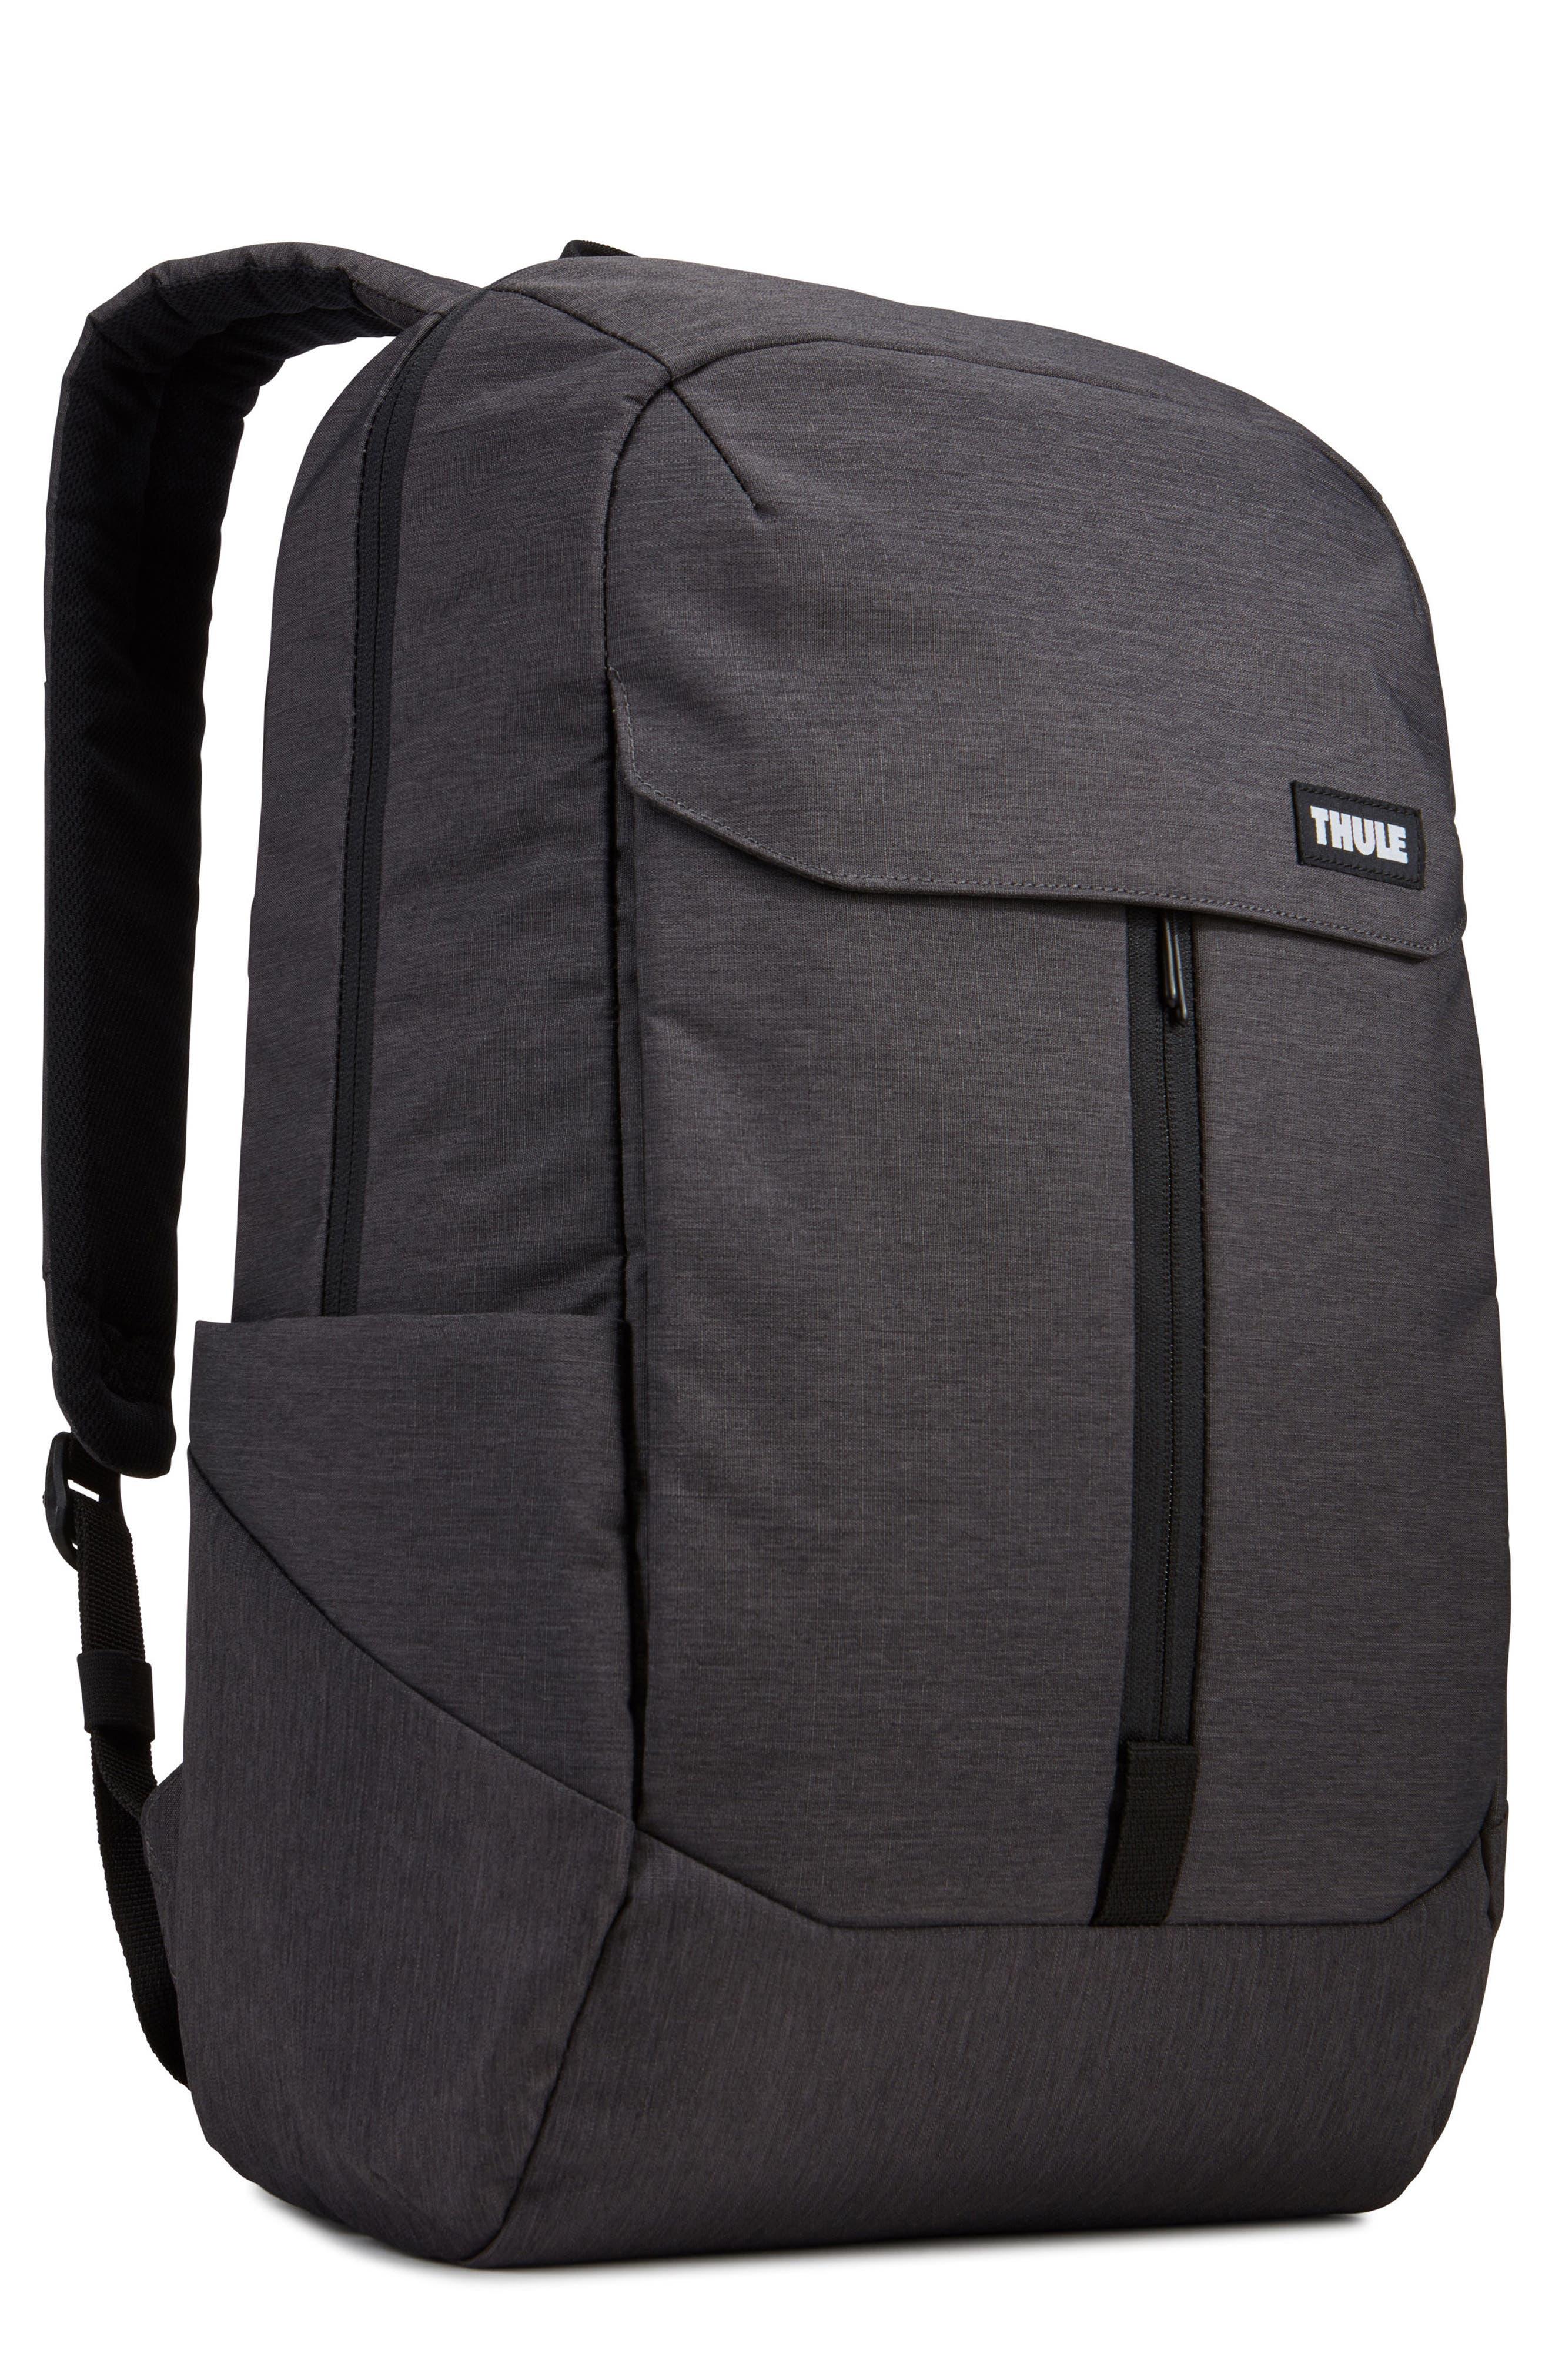 Lithos Backpack,                             Main thumbnail 1, color,                             Black